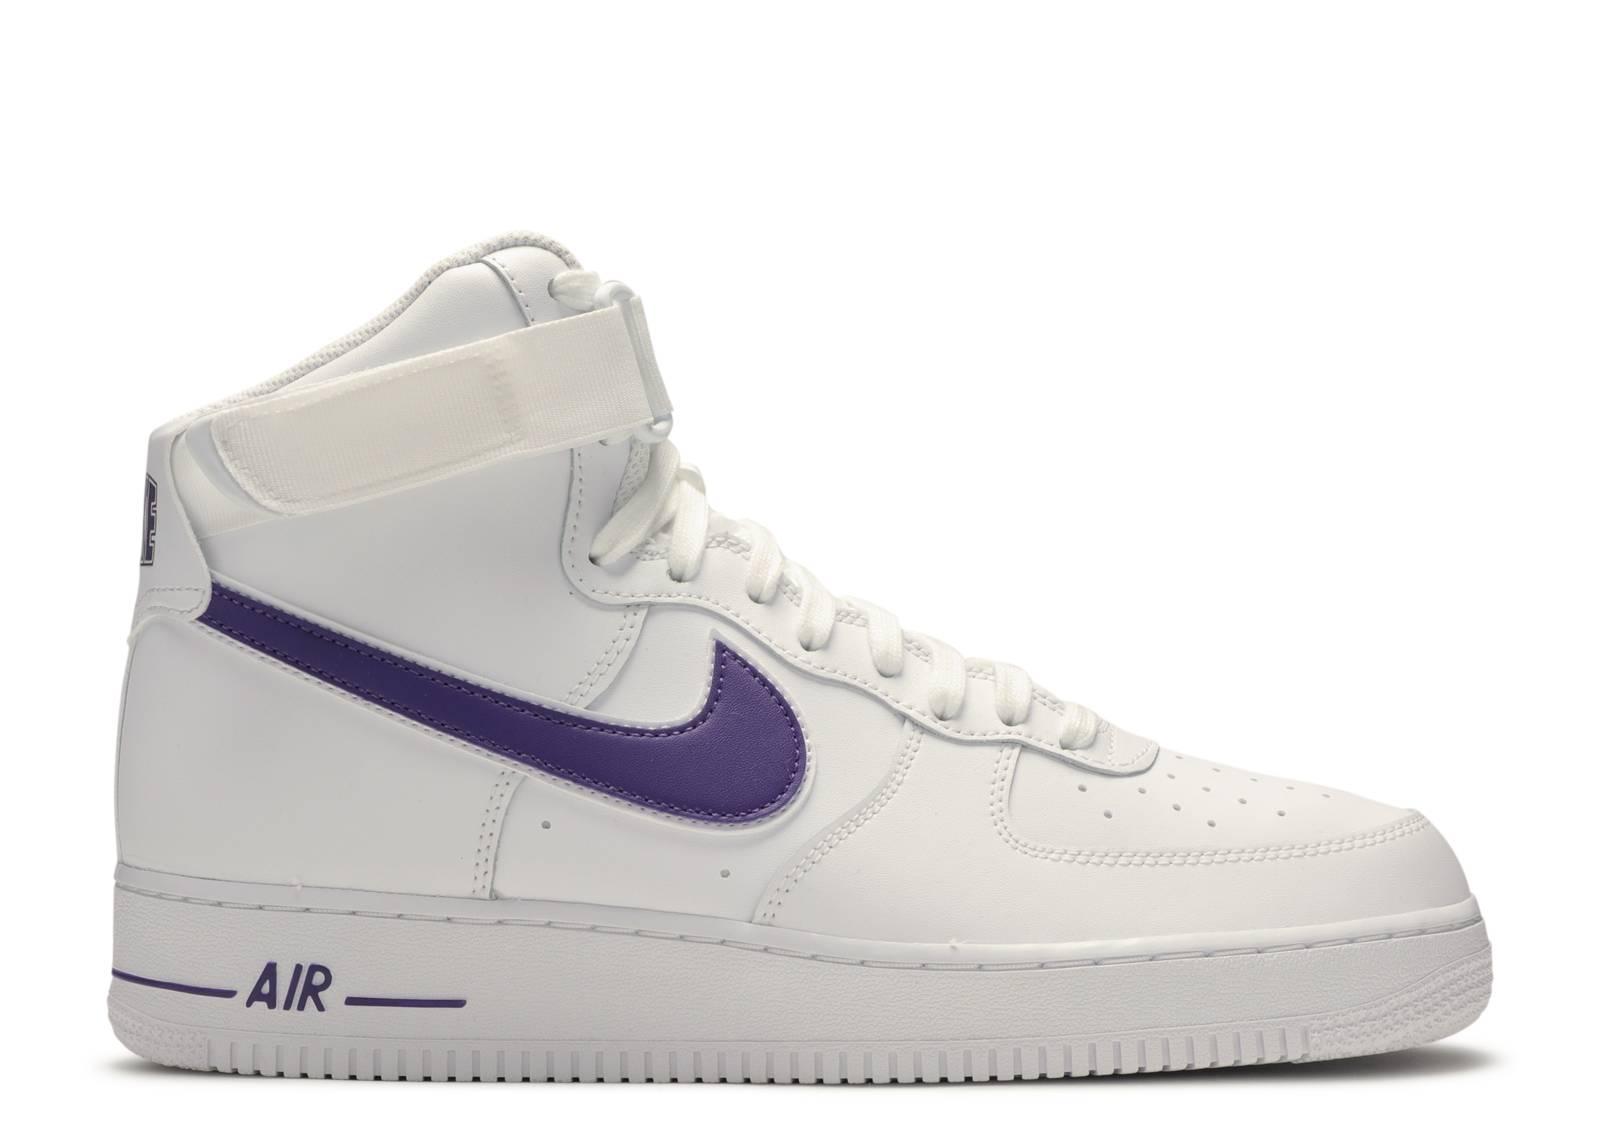 Air Force 1 High '07 'Court Purple'